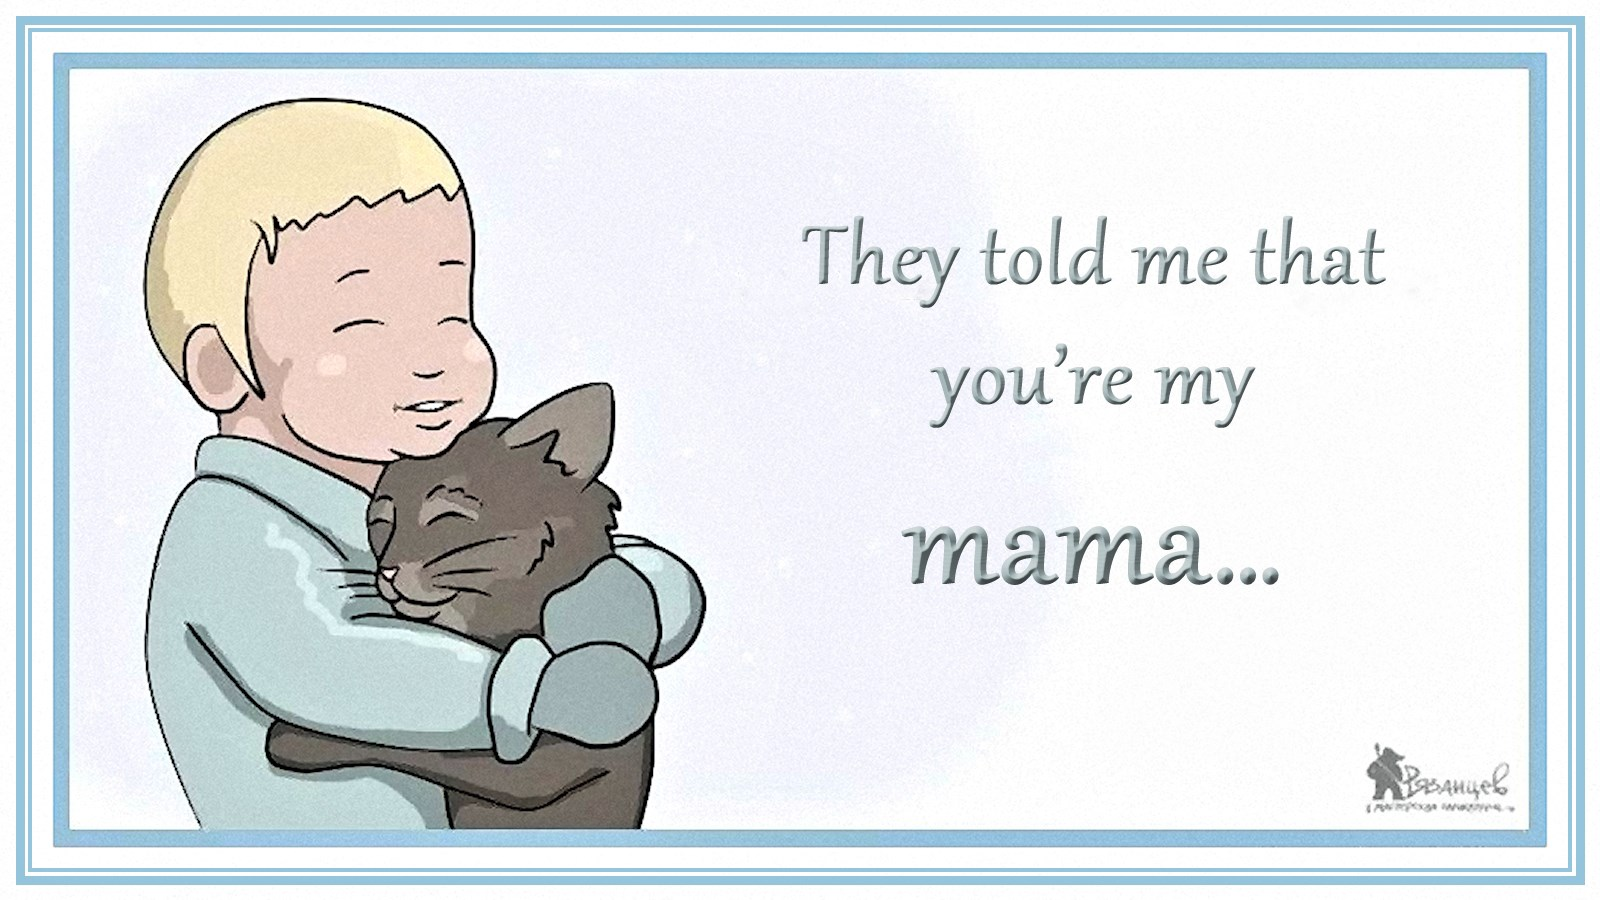 00 Taras Razantsev. They told me that you're my mama. 020715